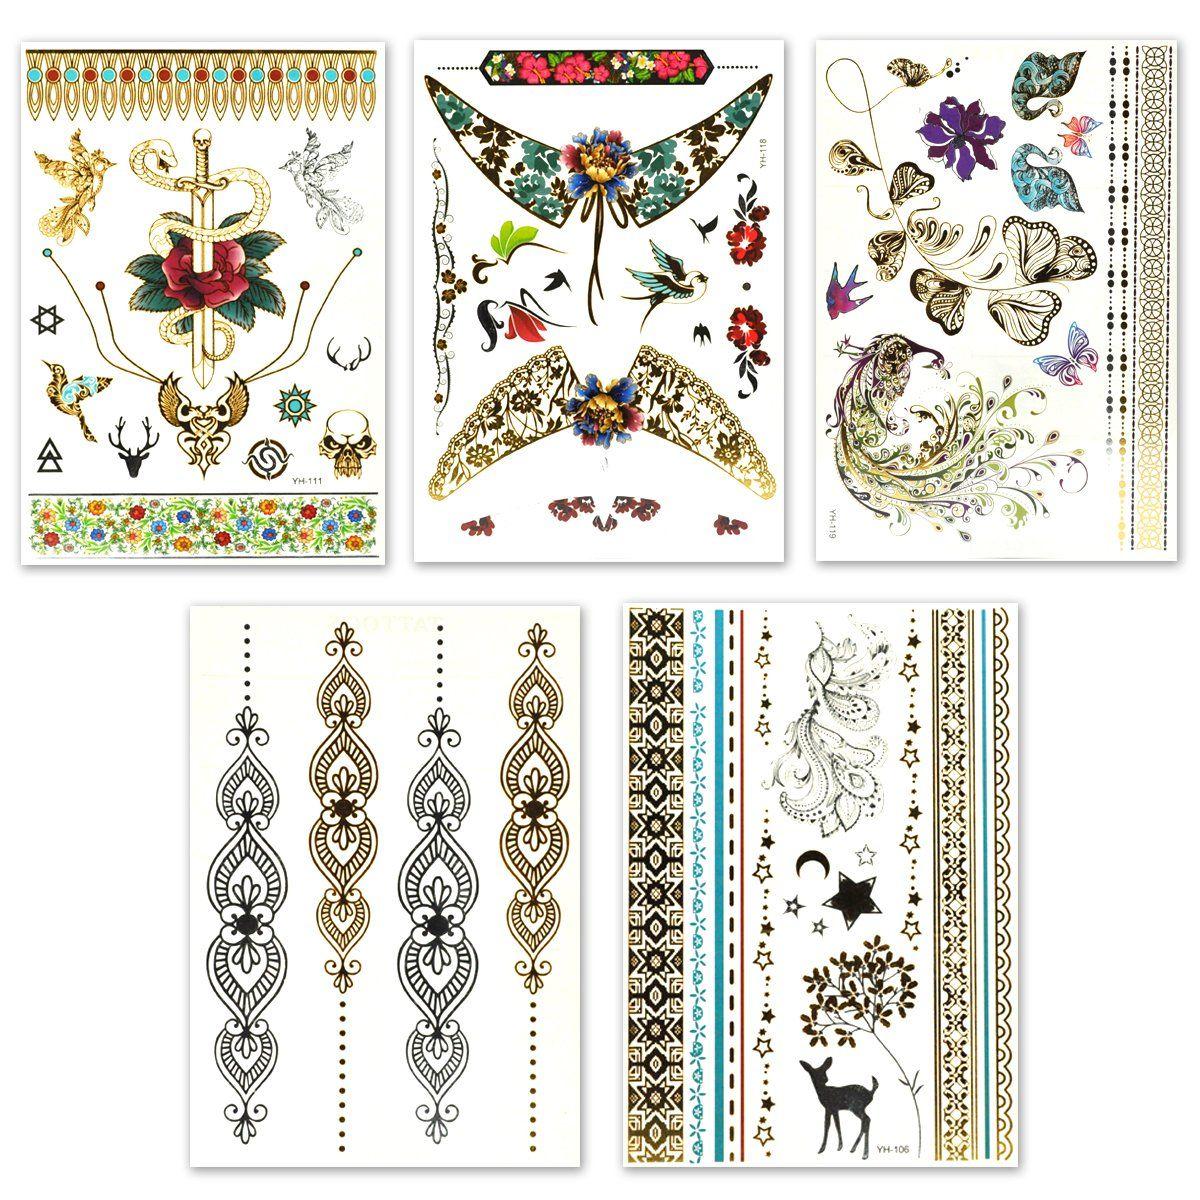 Lady Up Temporary Tattoos Super Cool 150 Designs Metallic Waterproof Henna Tattoo Stickers Decals 20 Sheets For Henna Tattoo Stickers Tattoo Stickers Body Art